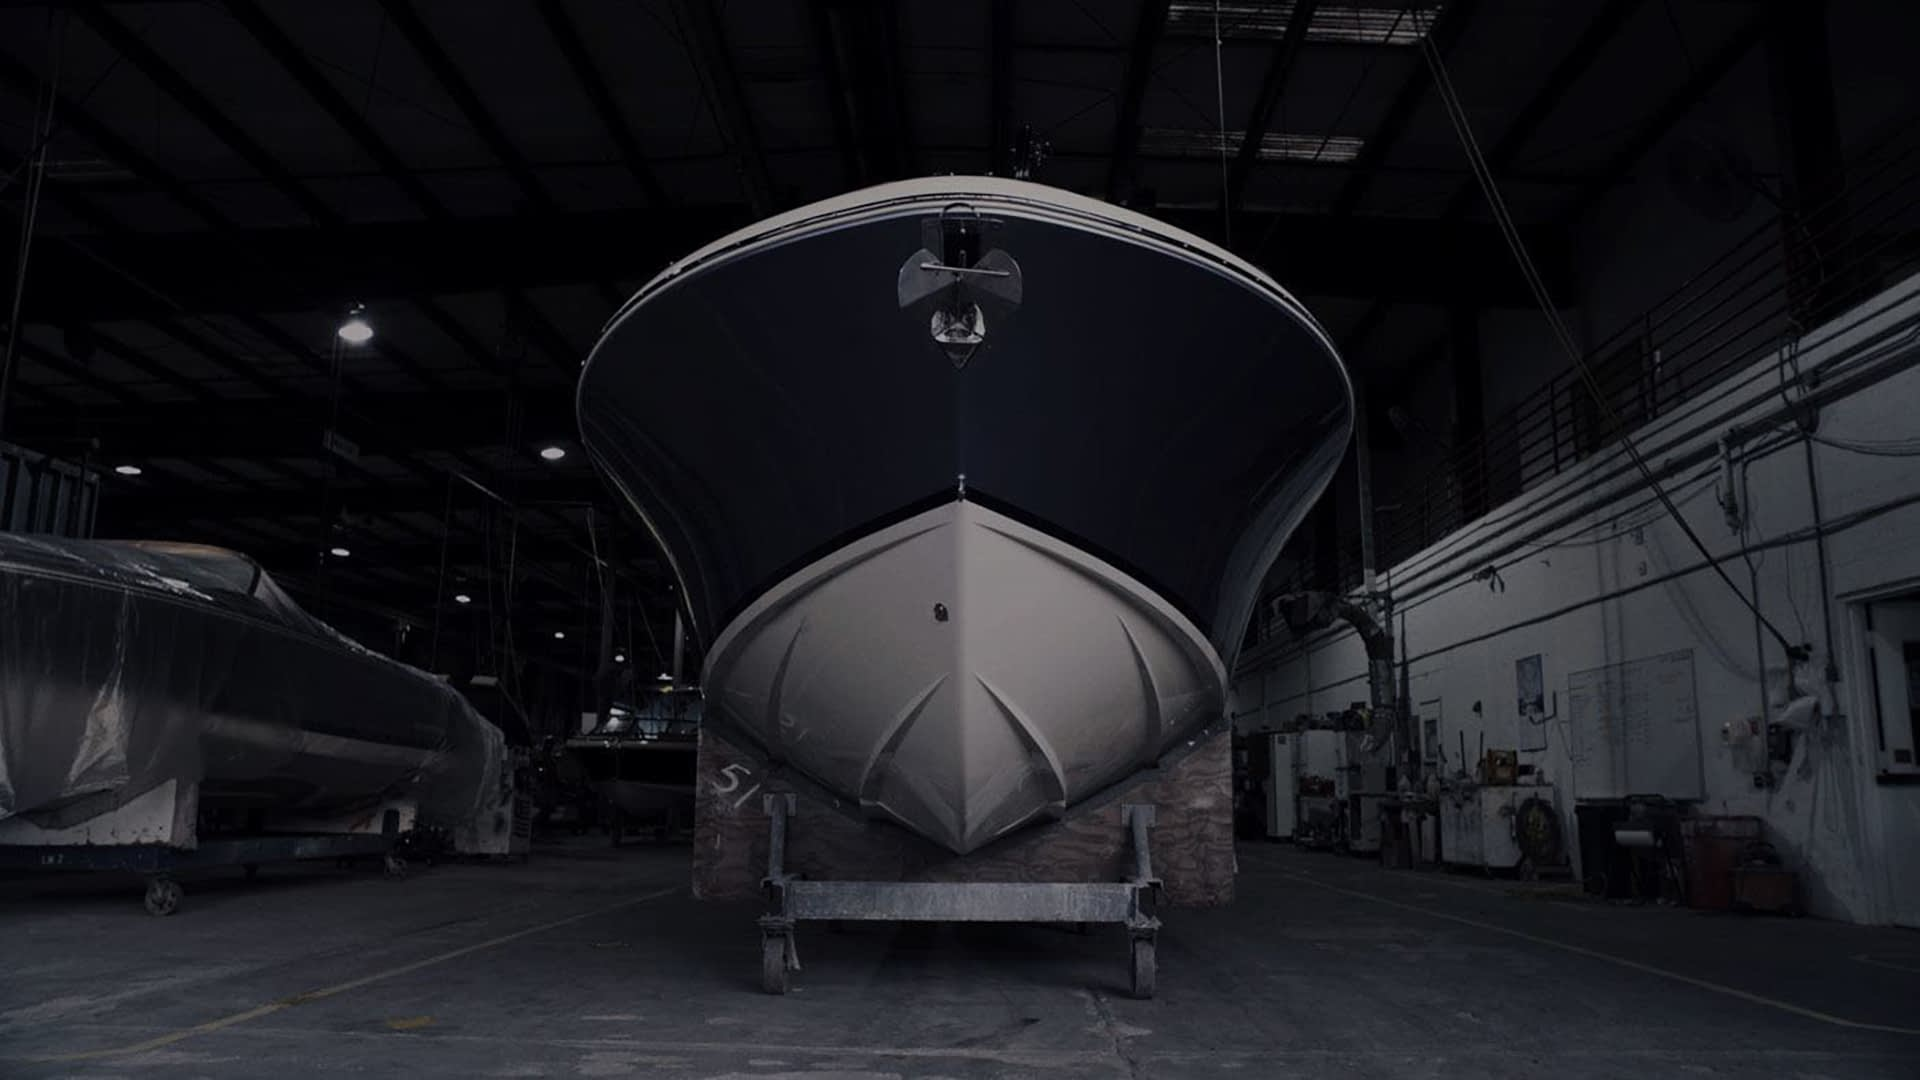 Chris Craft boat in garage